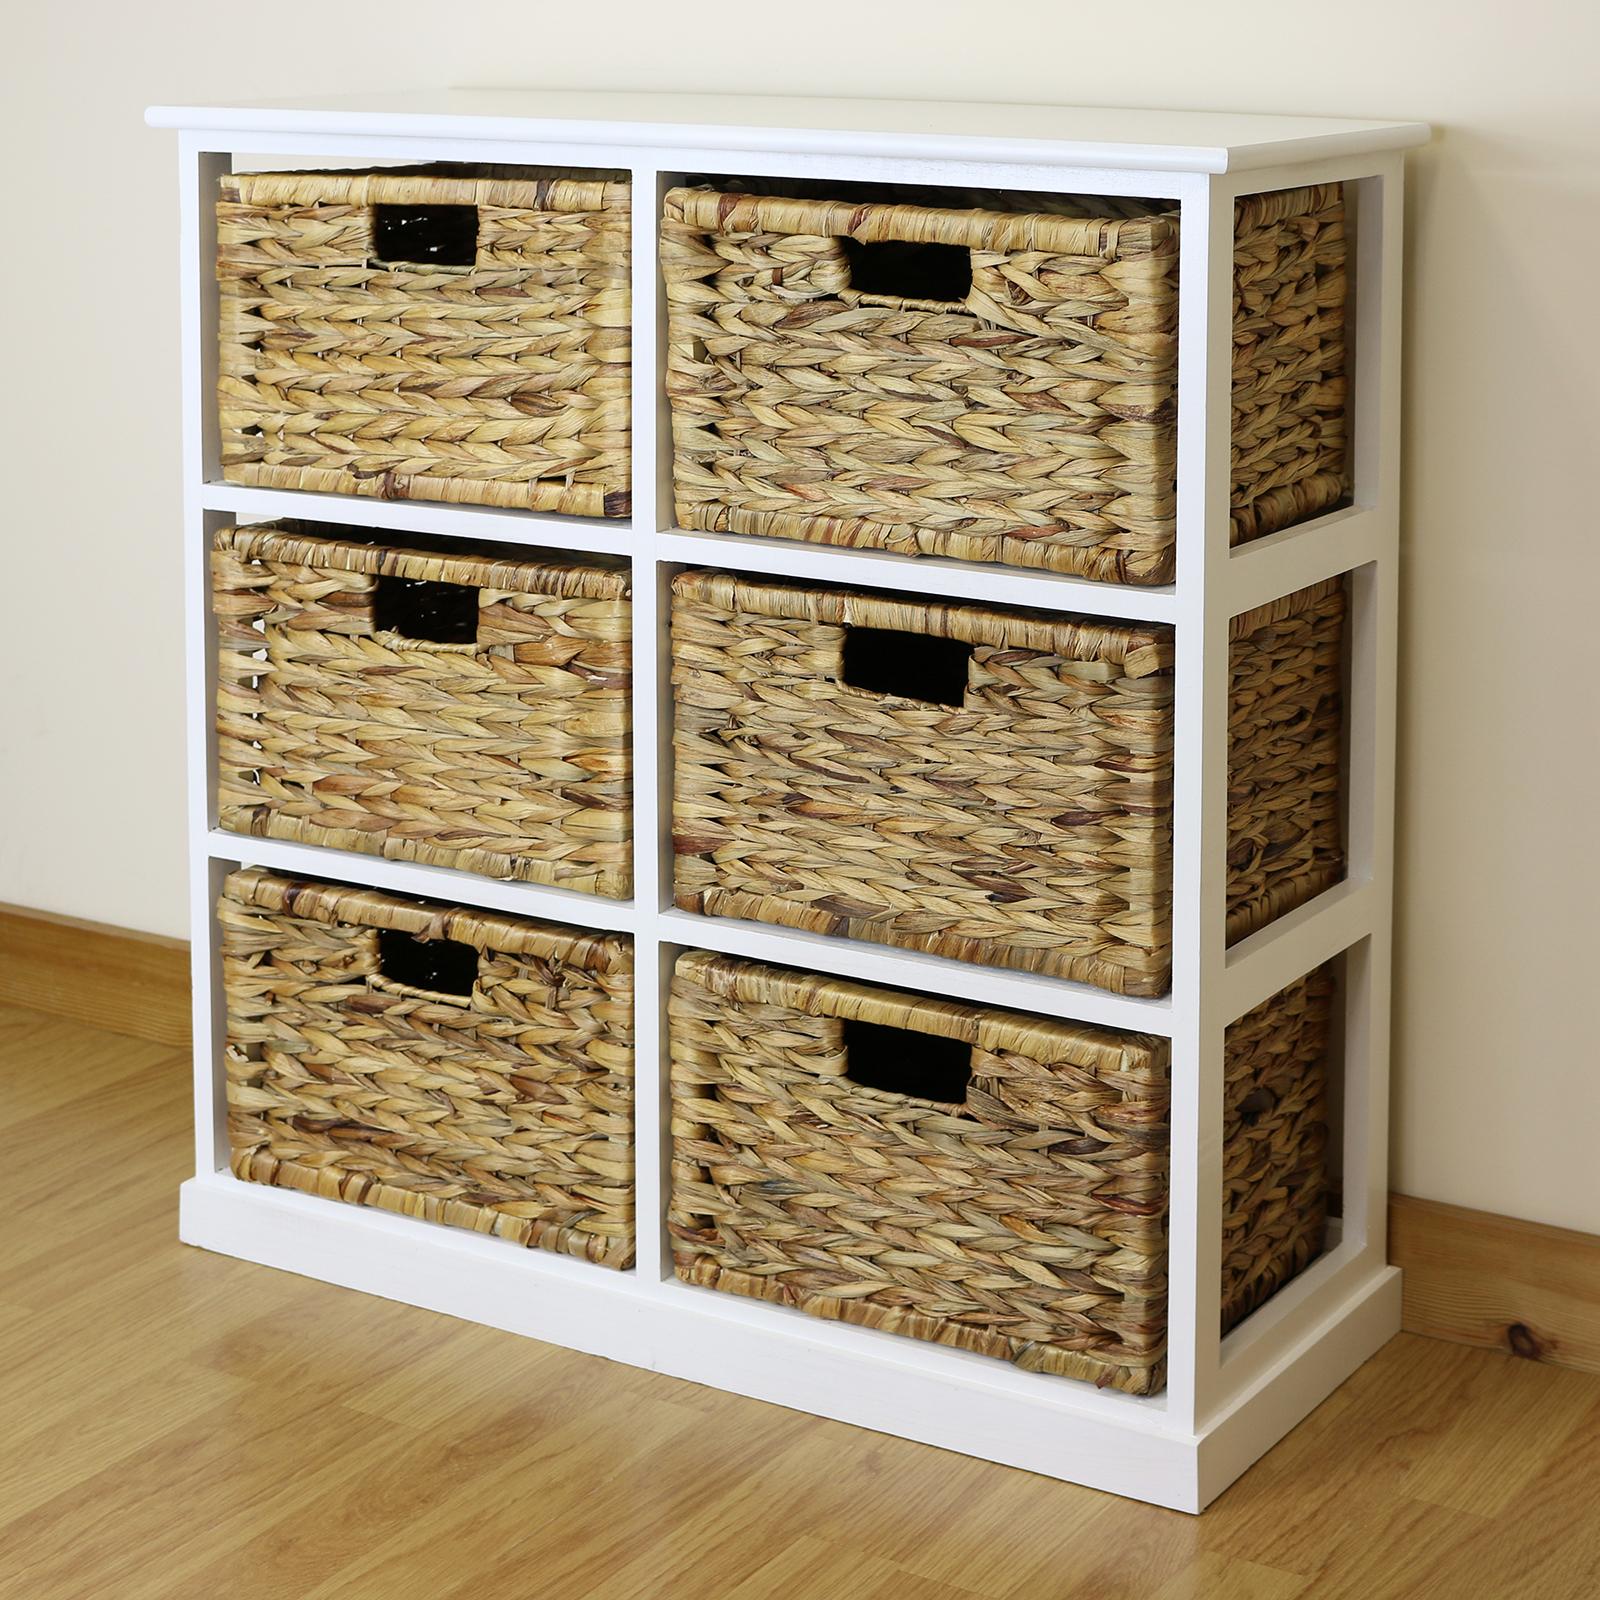 Sentinel White 6 Drawer Basket Storage Side Unit Lounge/Bathroom  Nursery/Bedroom Chest